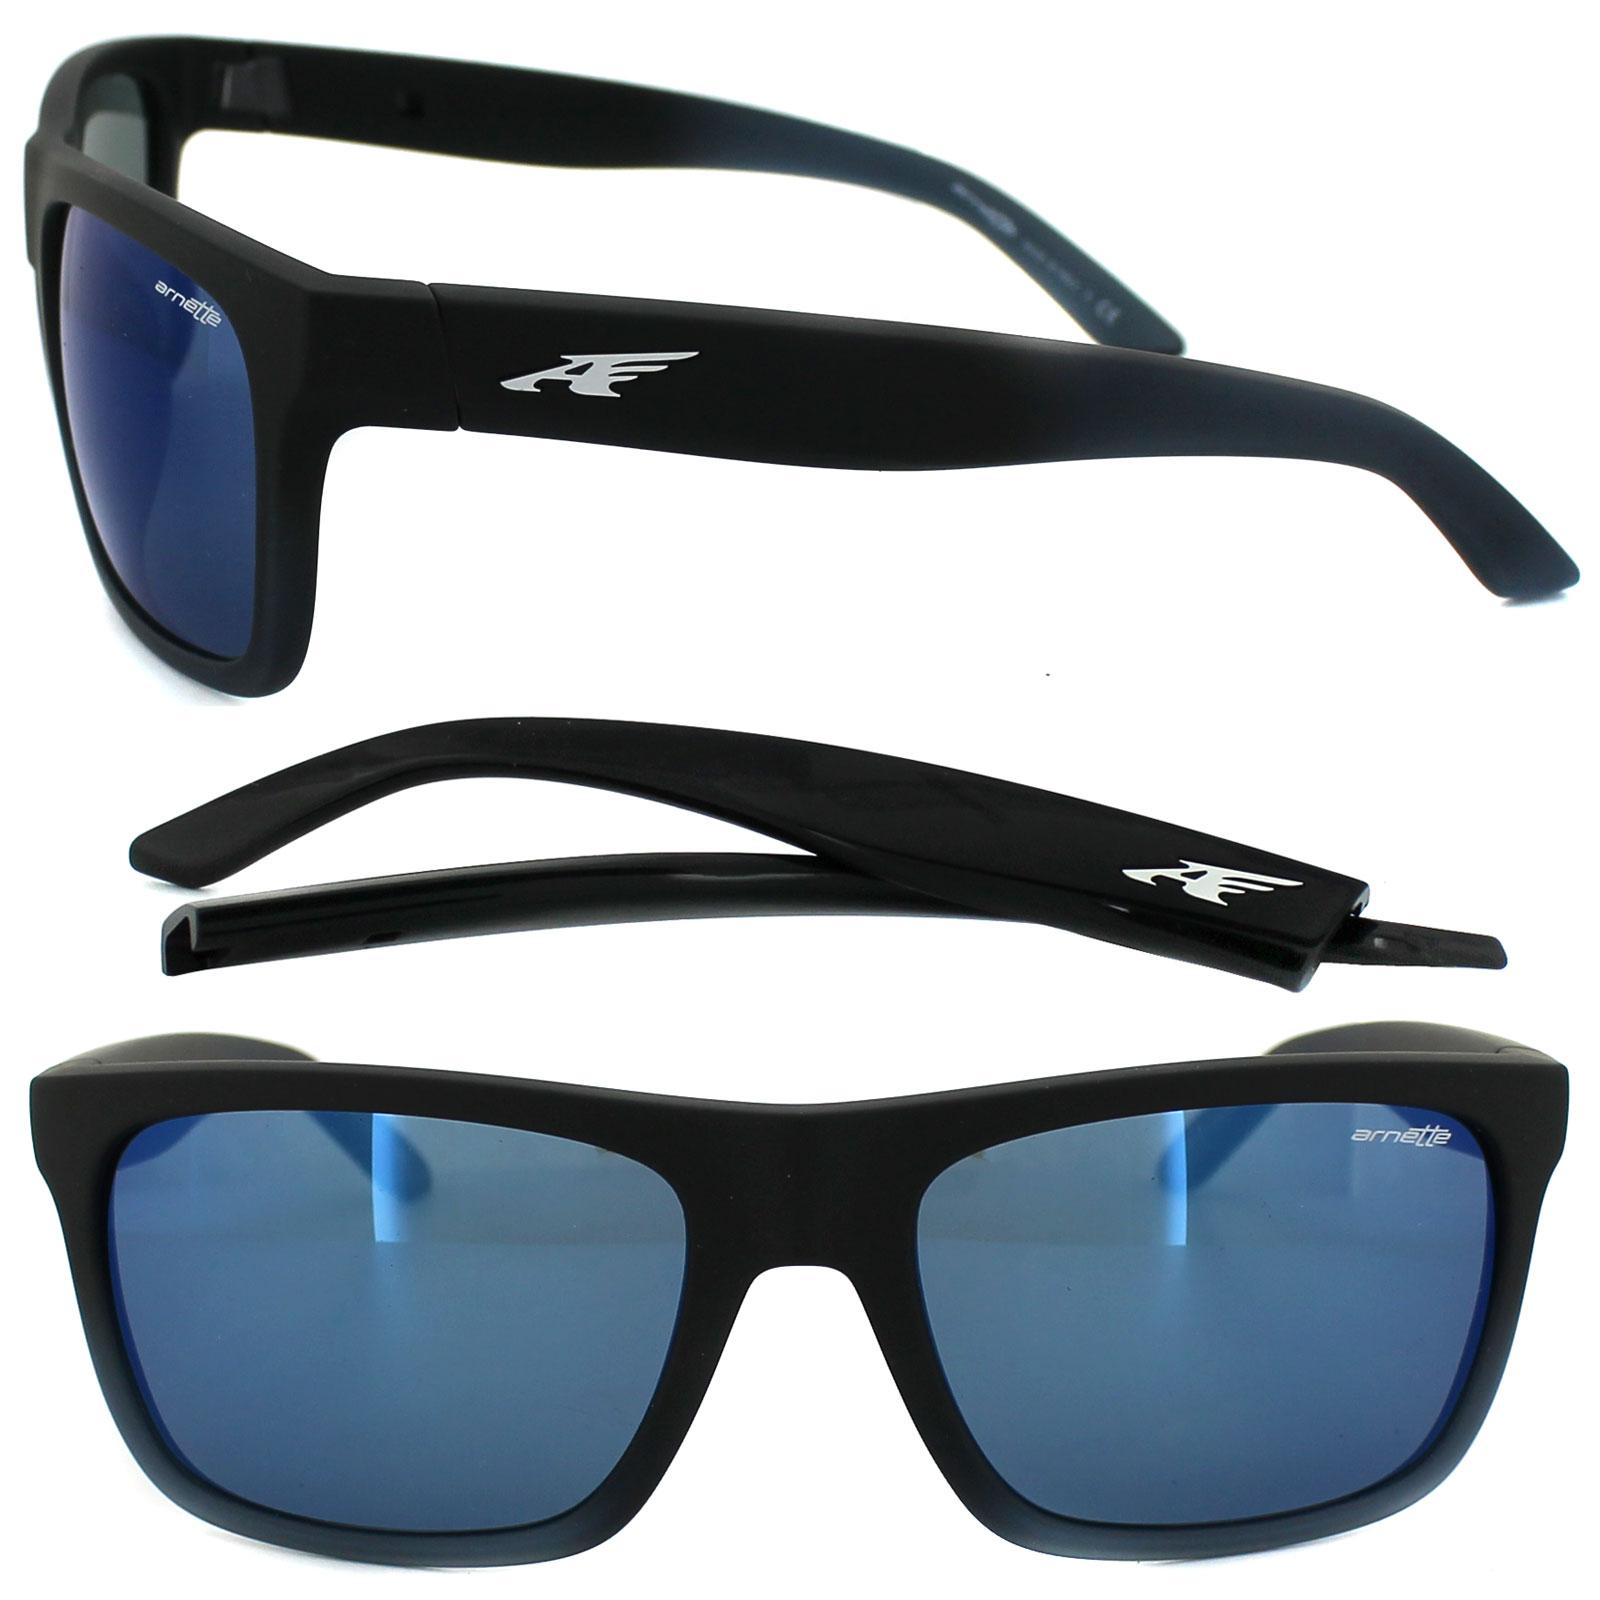 fbf1e95ba3 Sentinel arnette sunglasses dropout fuzzy black fade to blueberry blue  mirror jpg 1600x1600 Arnette sunglass models